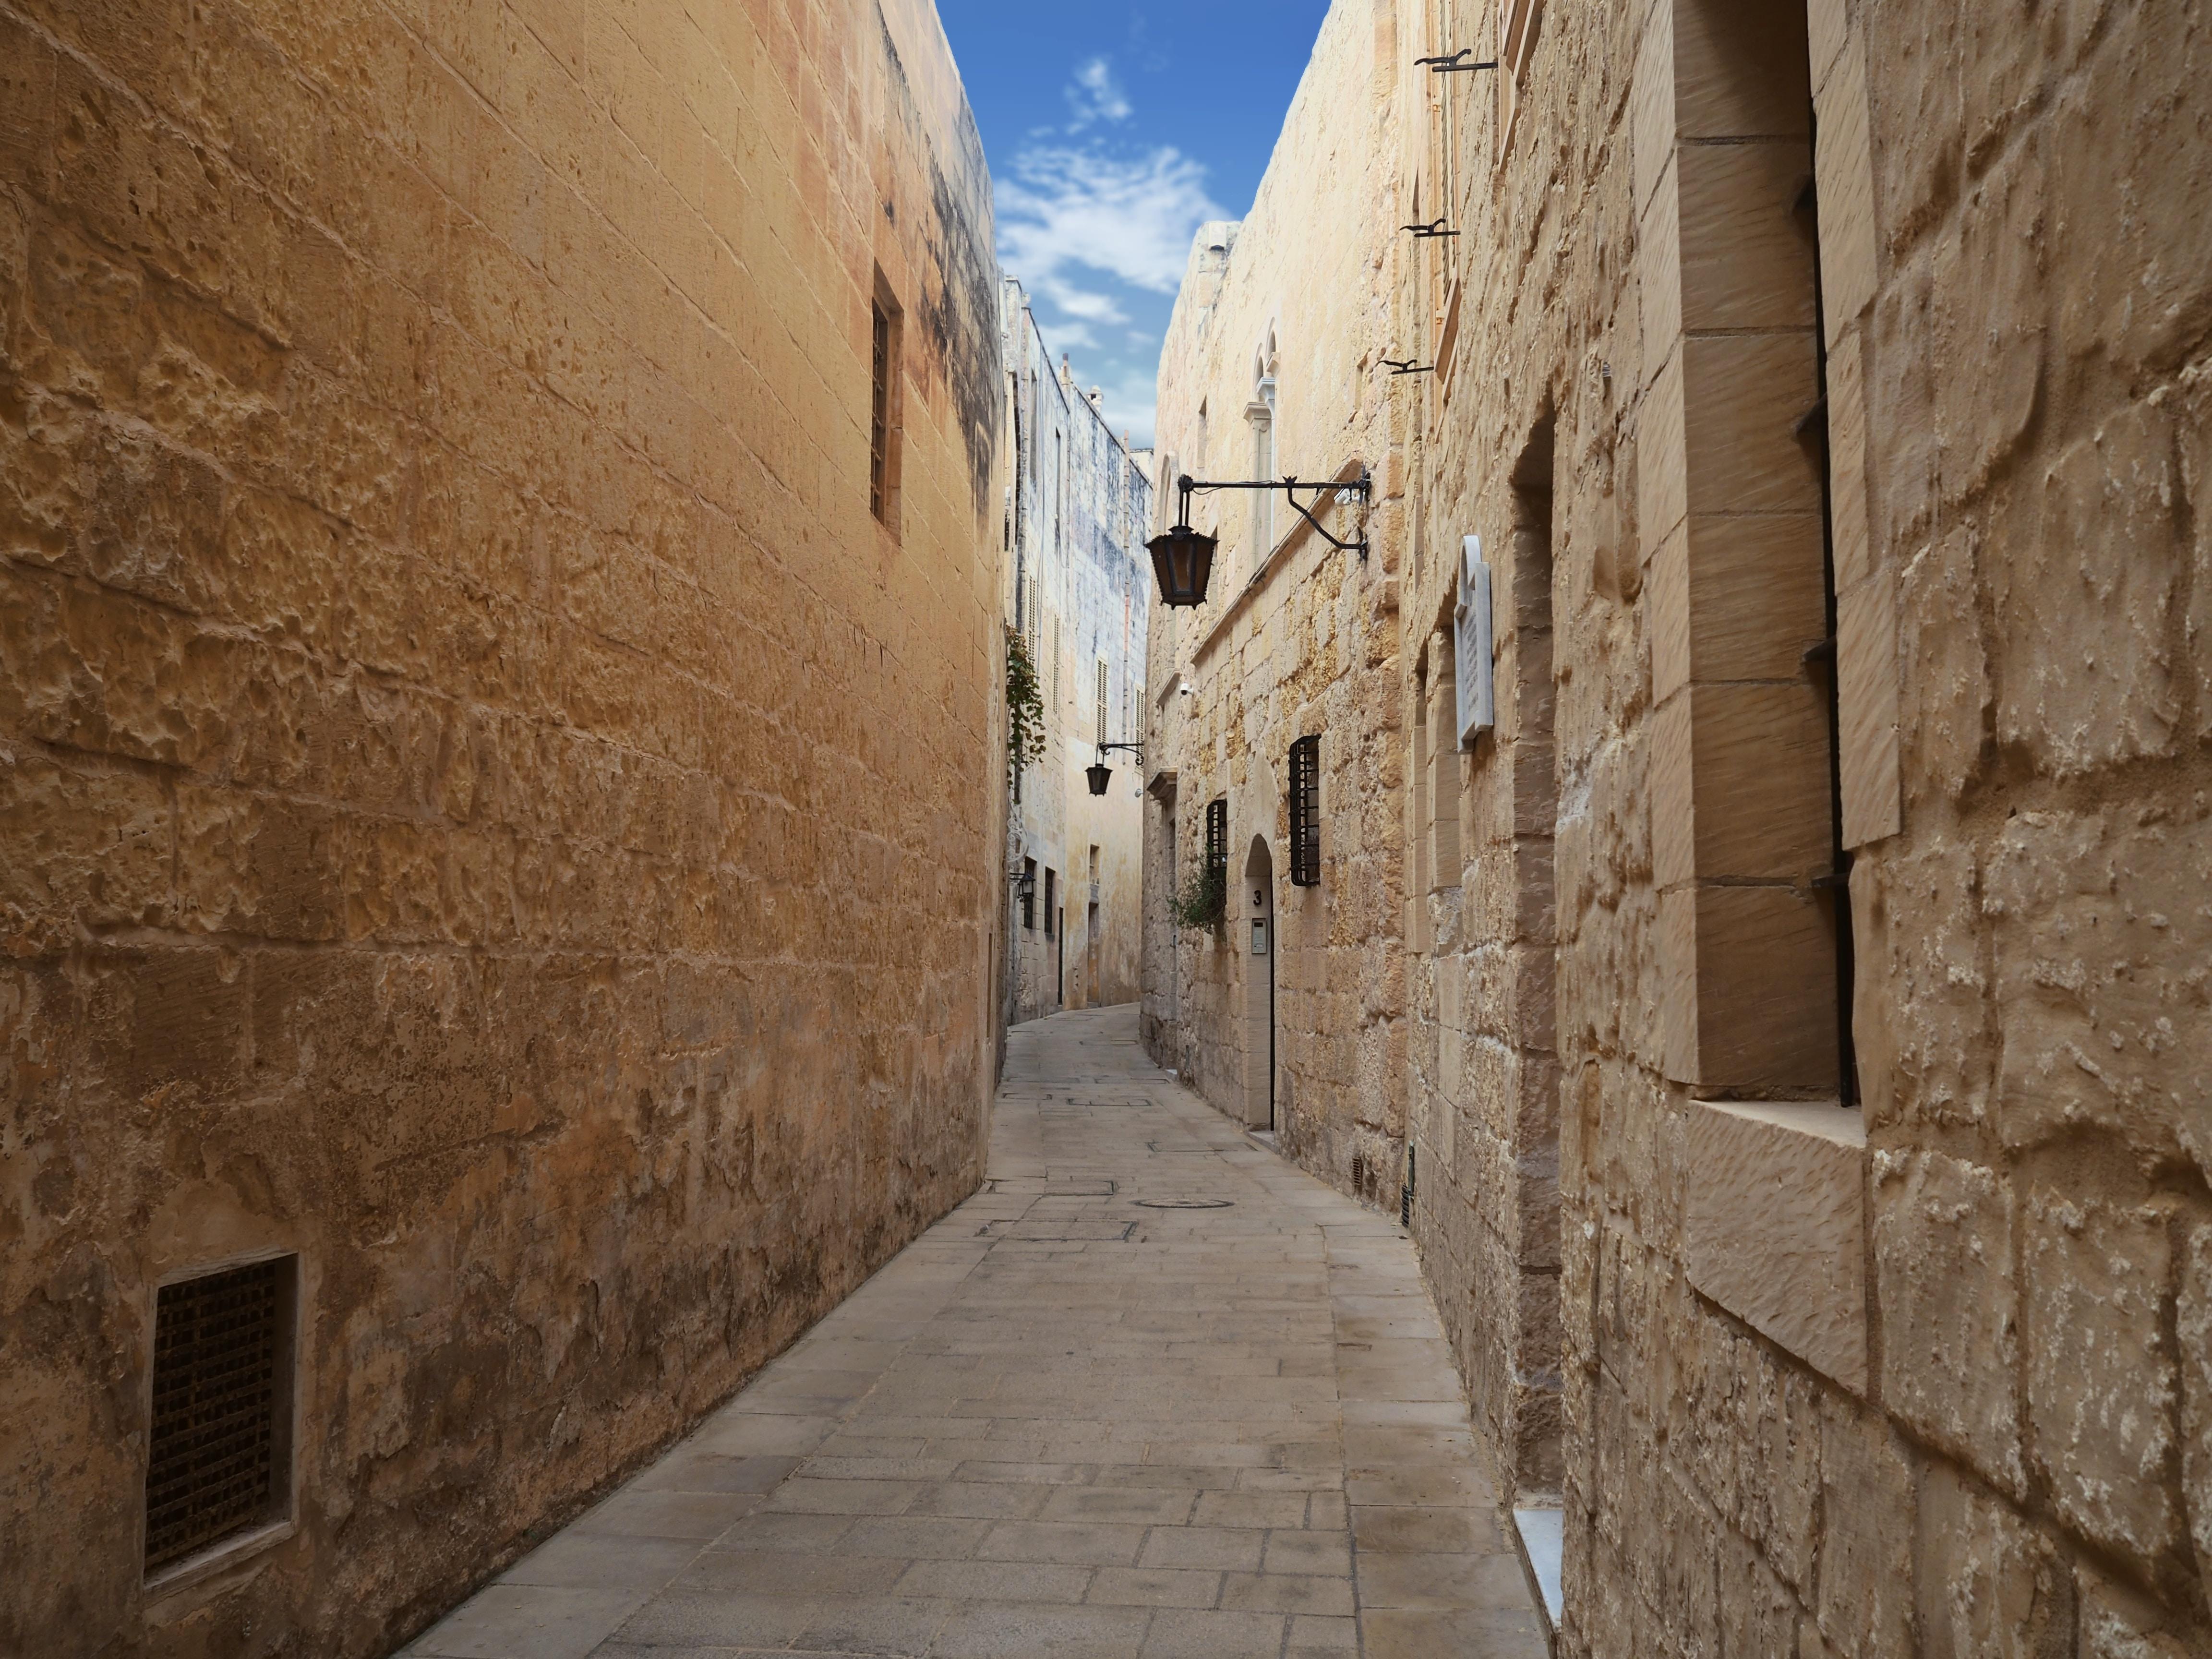 narrow hallway in between brown brick houses